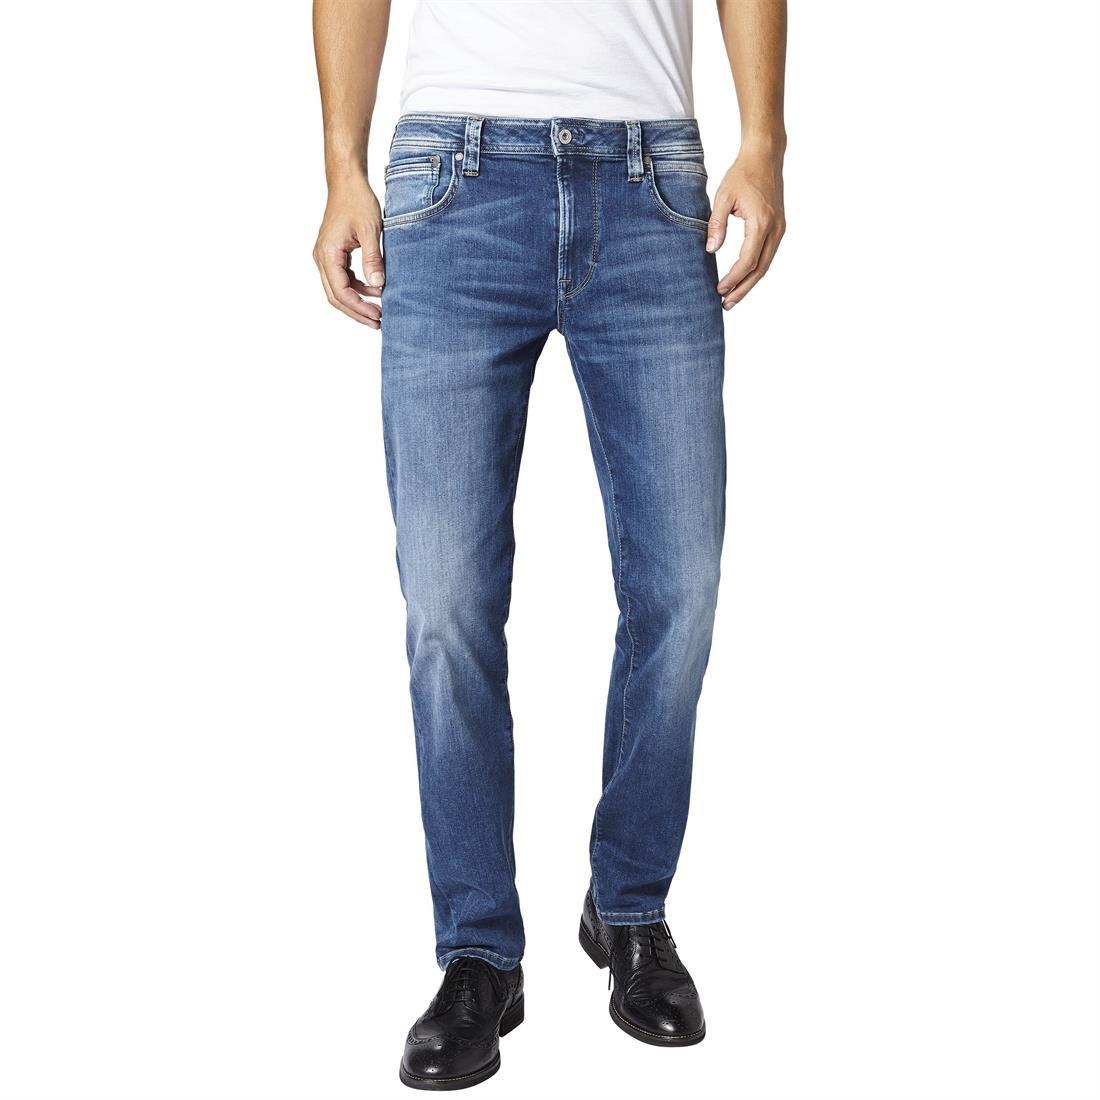 Pepe Jeans Jeans Rectos para Hombre